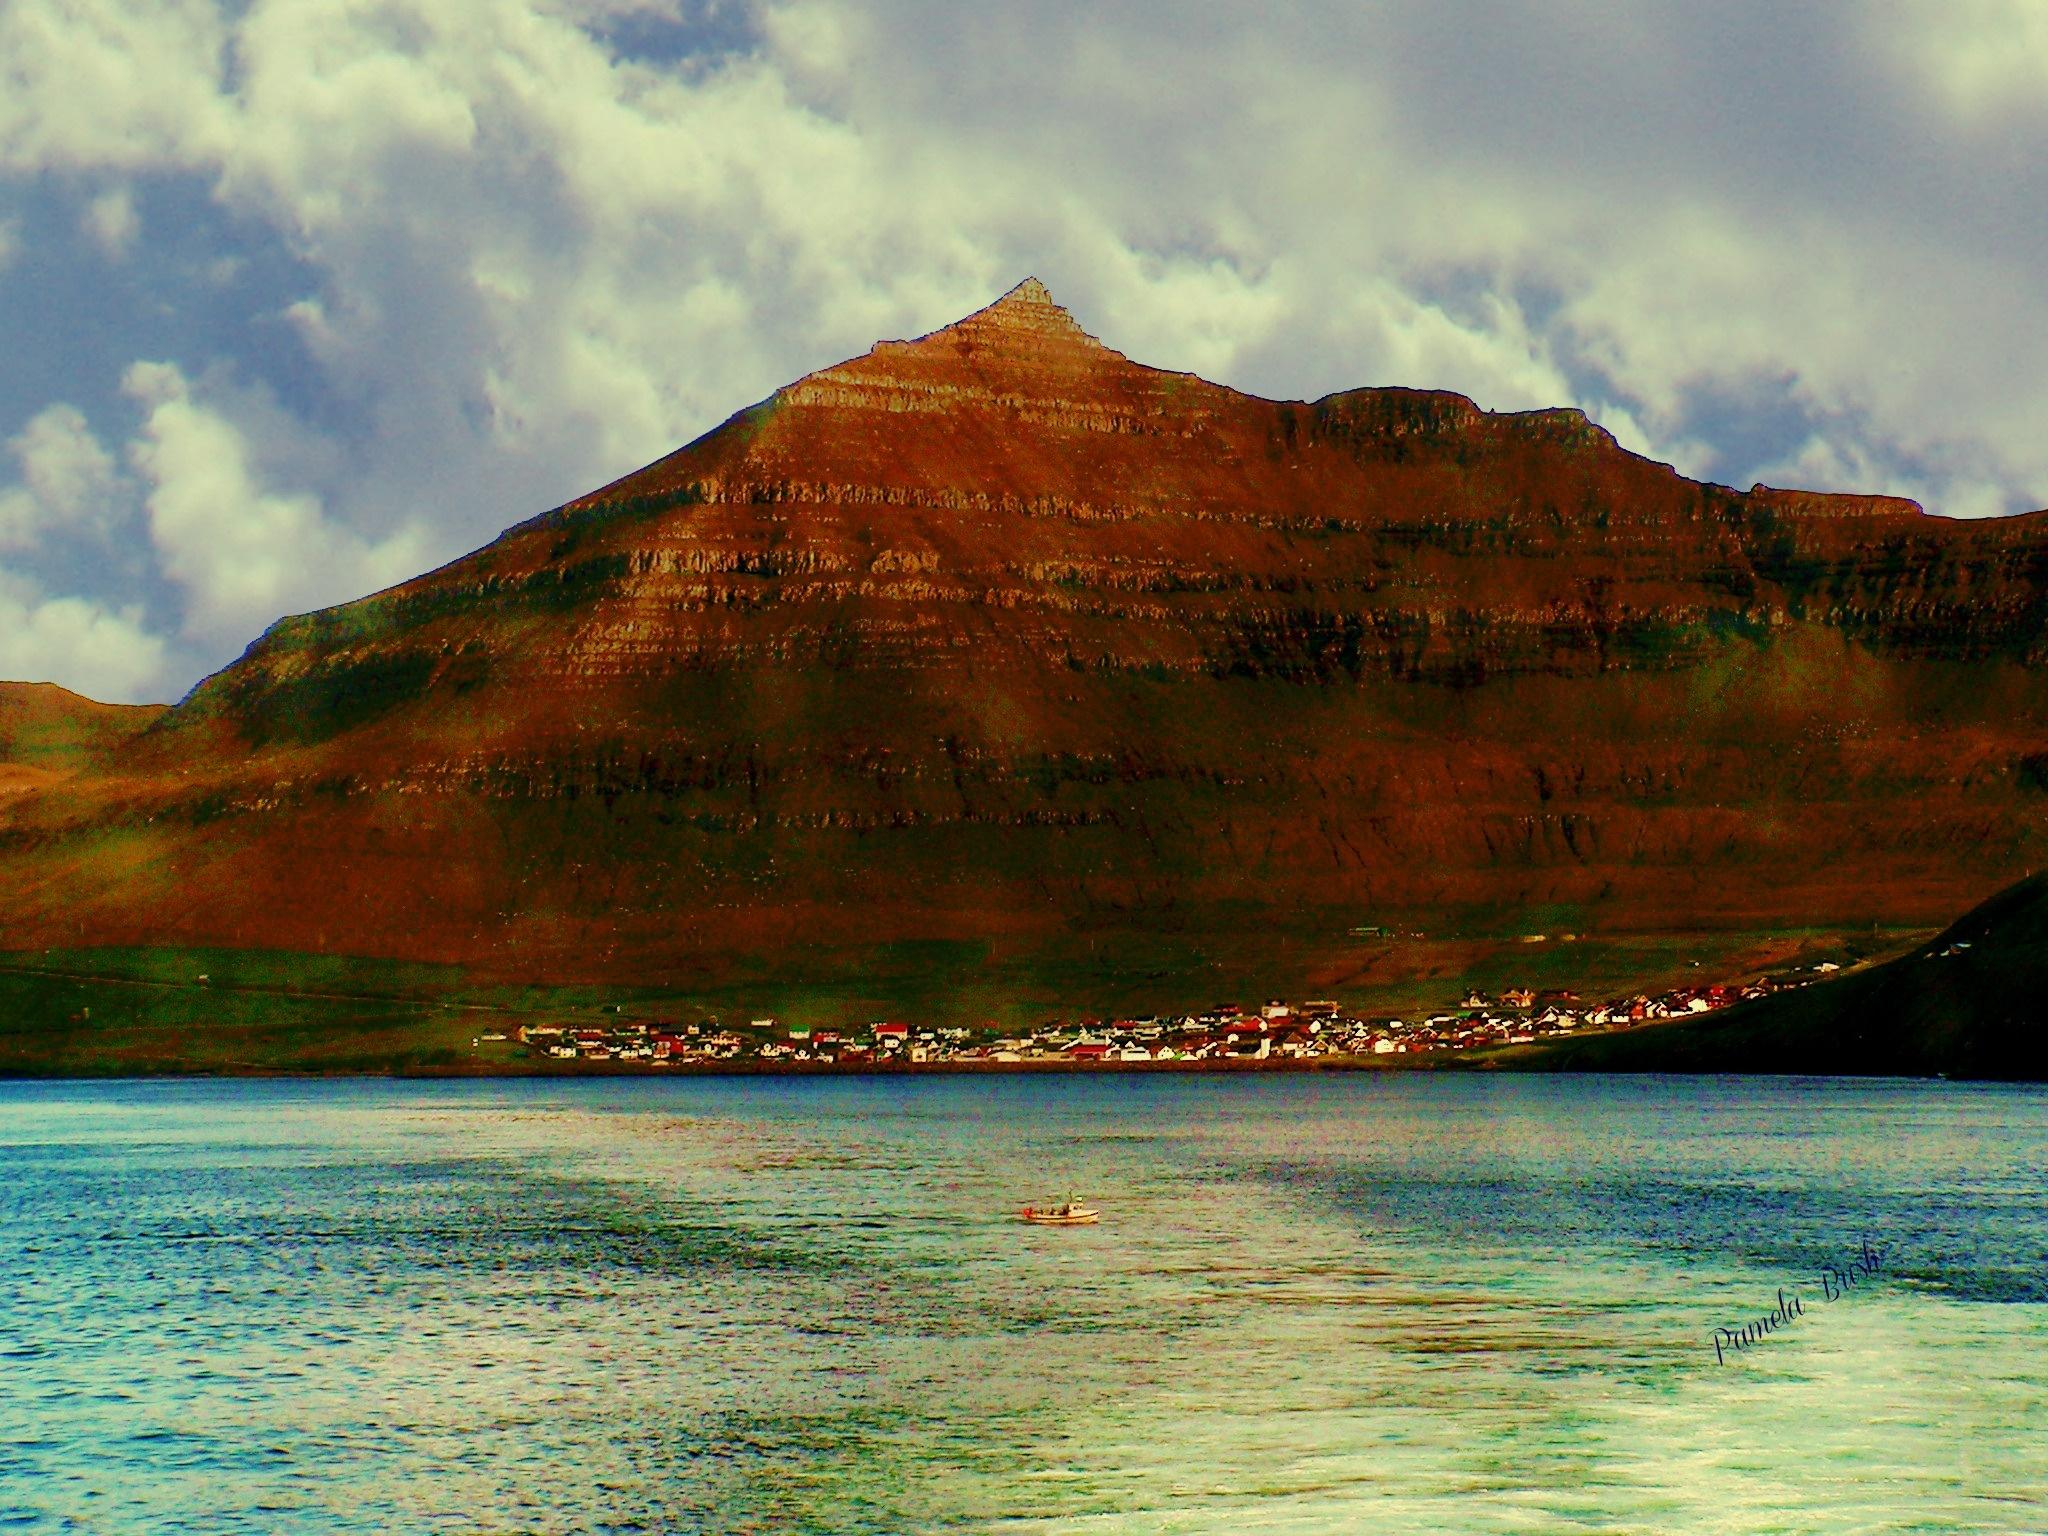 Leaving Faroes  by Cumbria Ladd